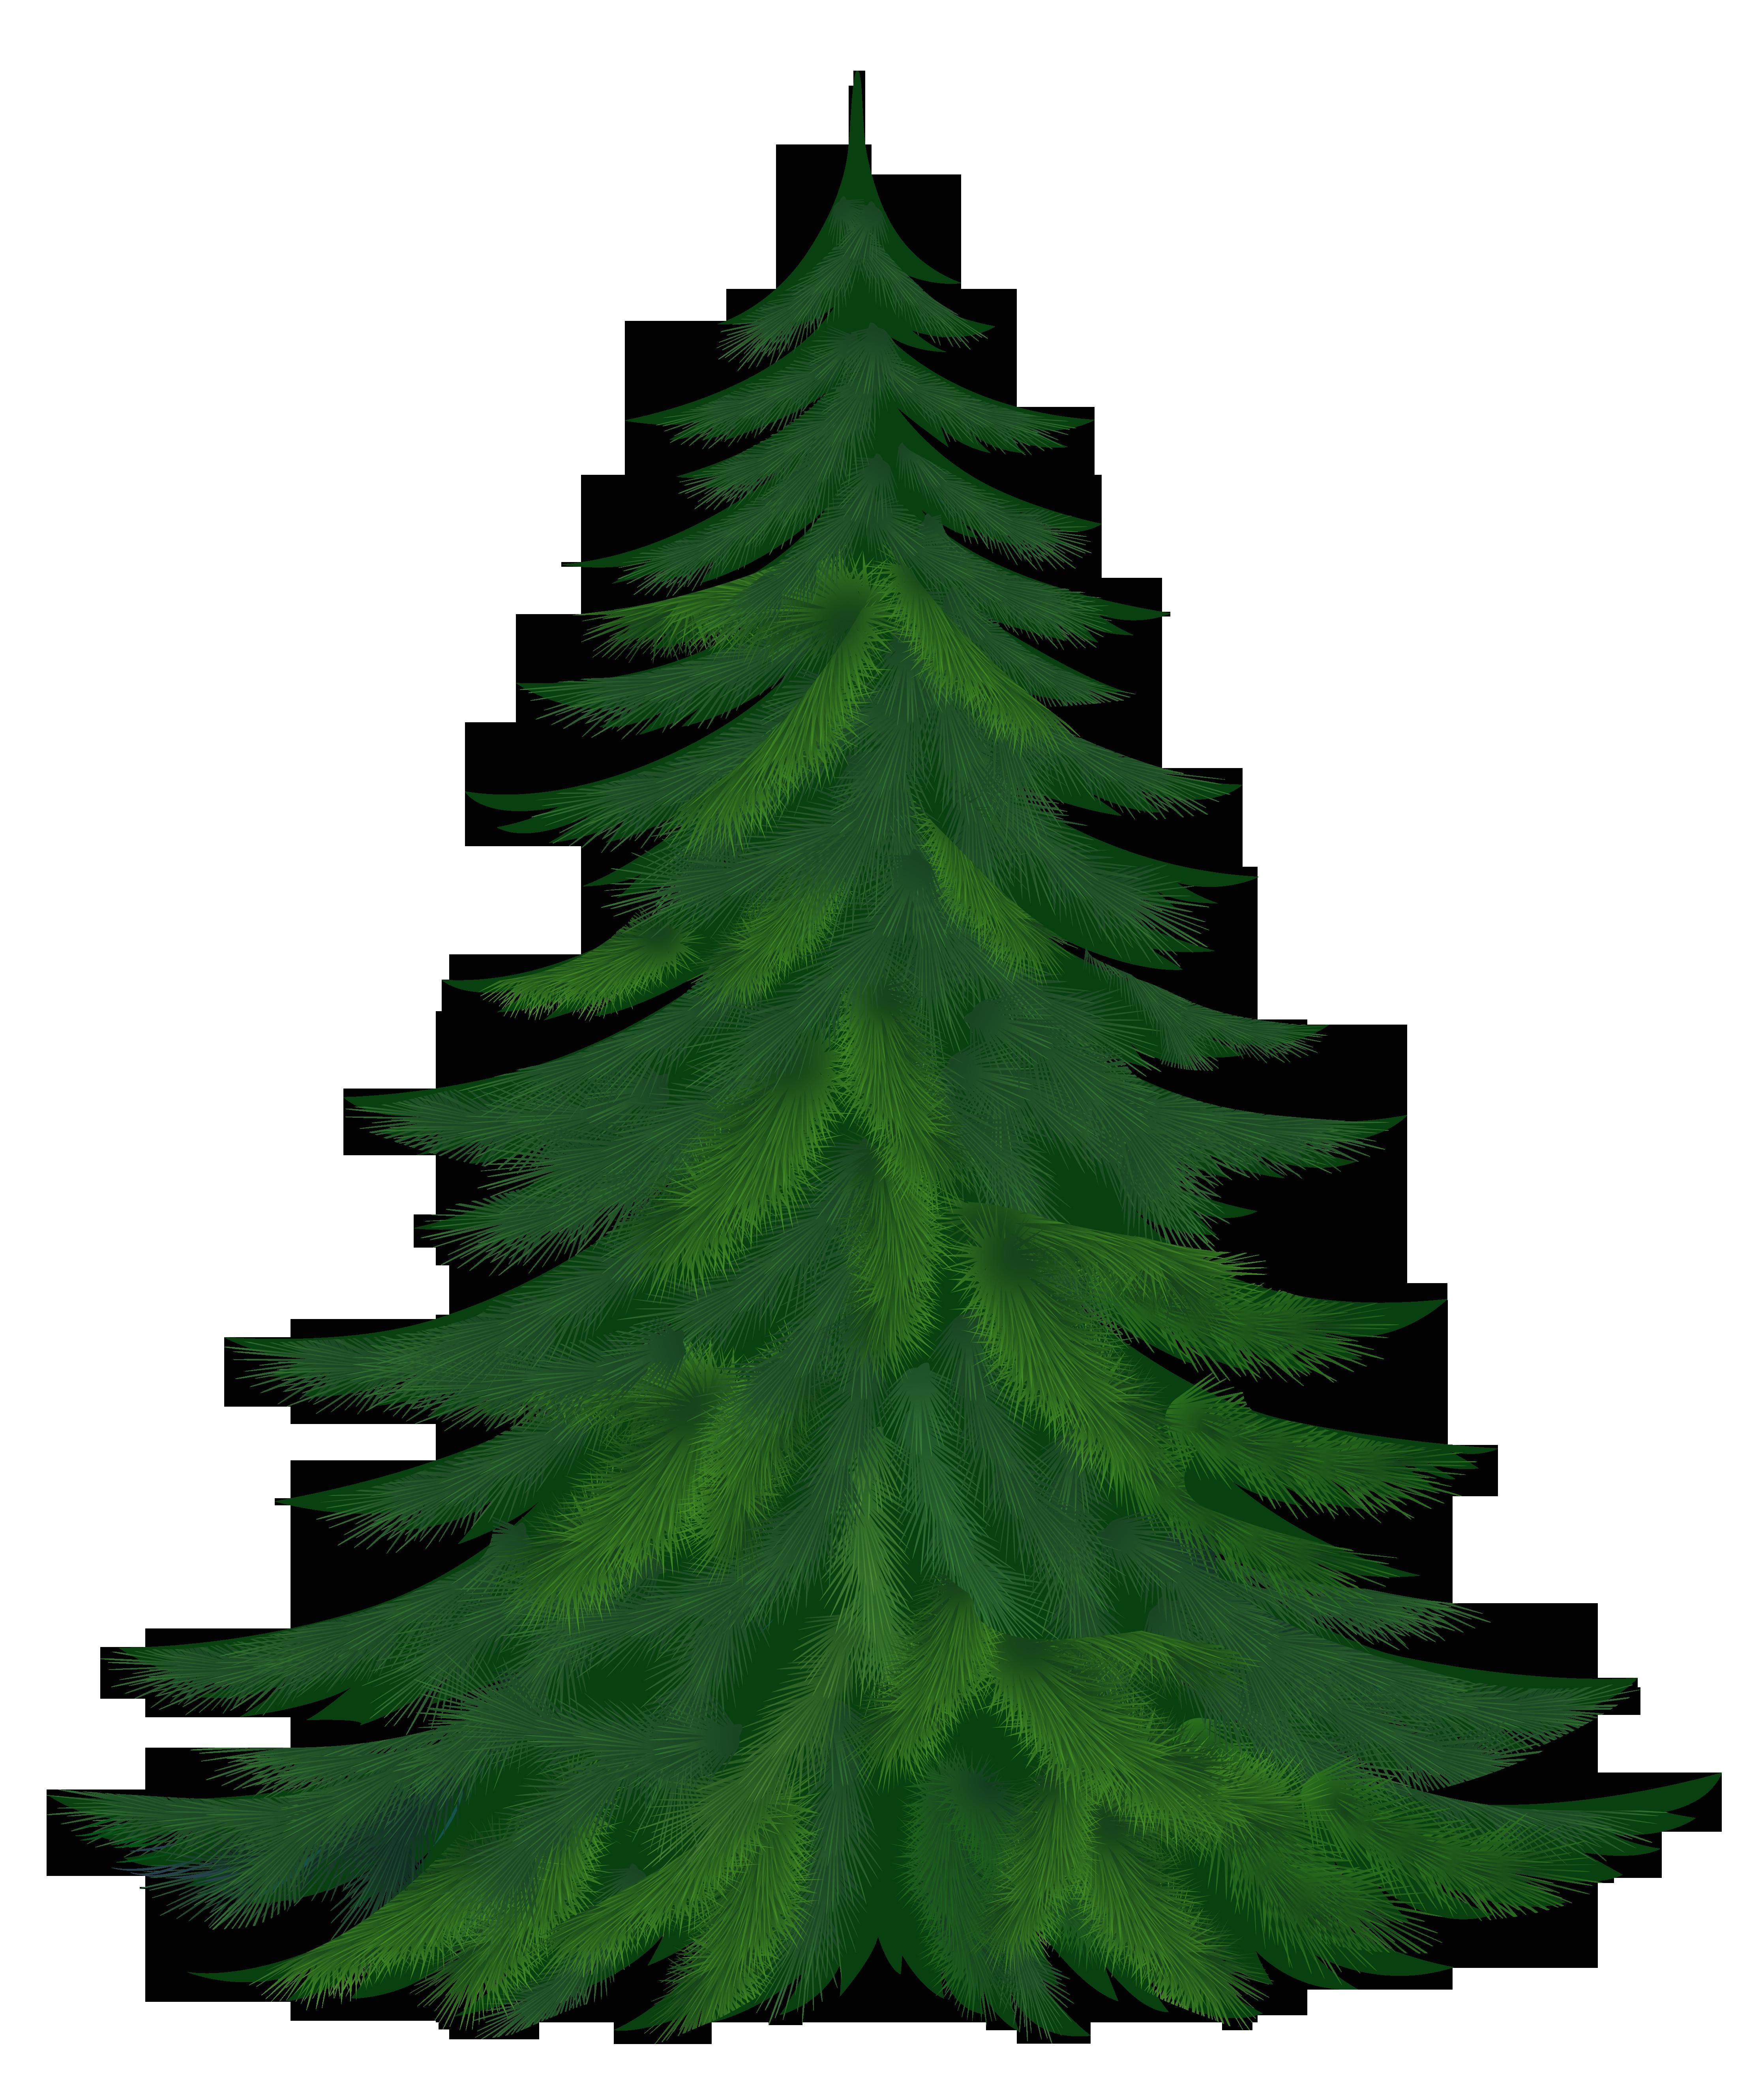 4469x5265 Pine Tree Clipart Three Pine